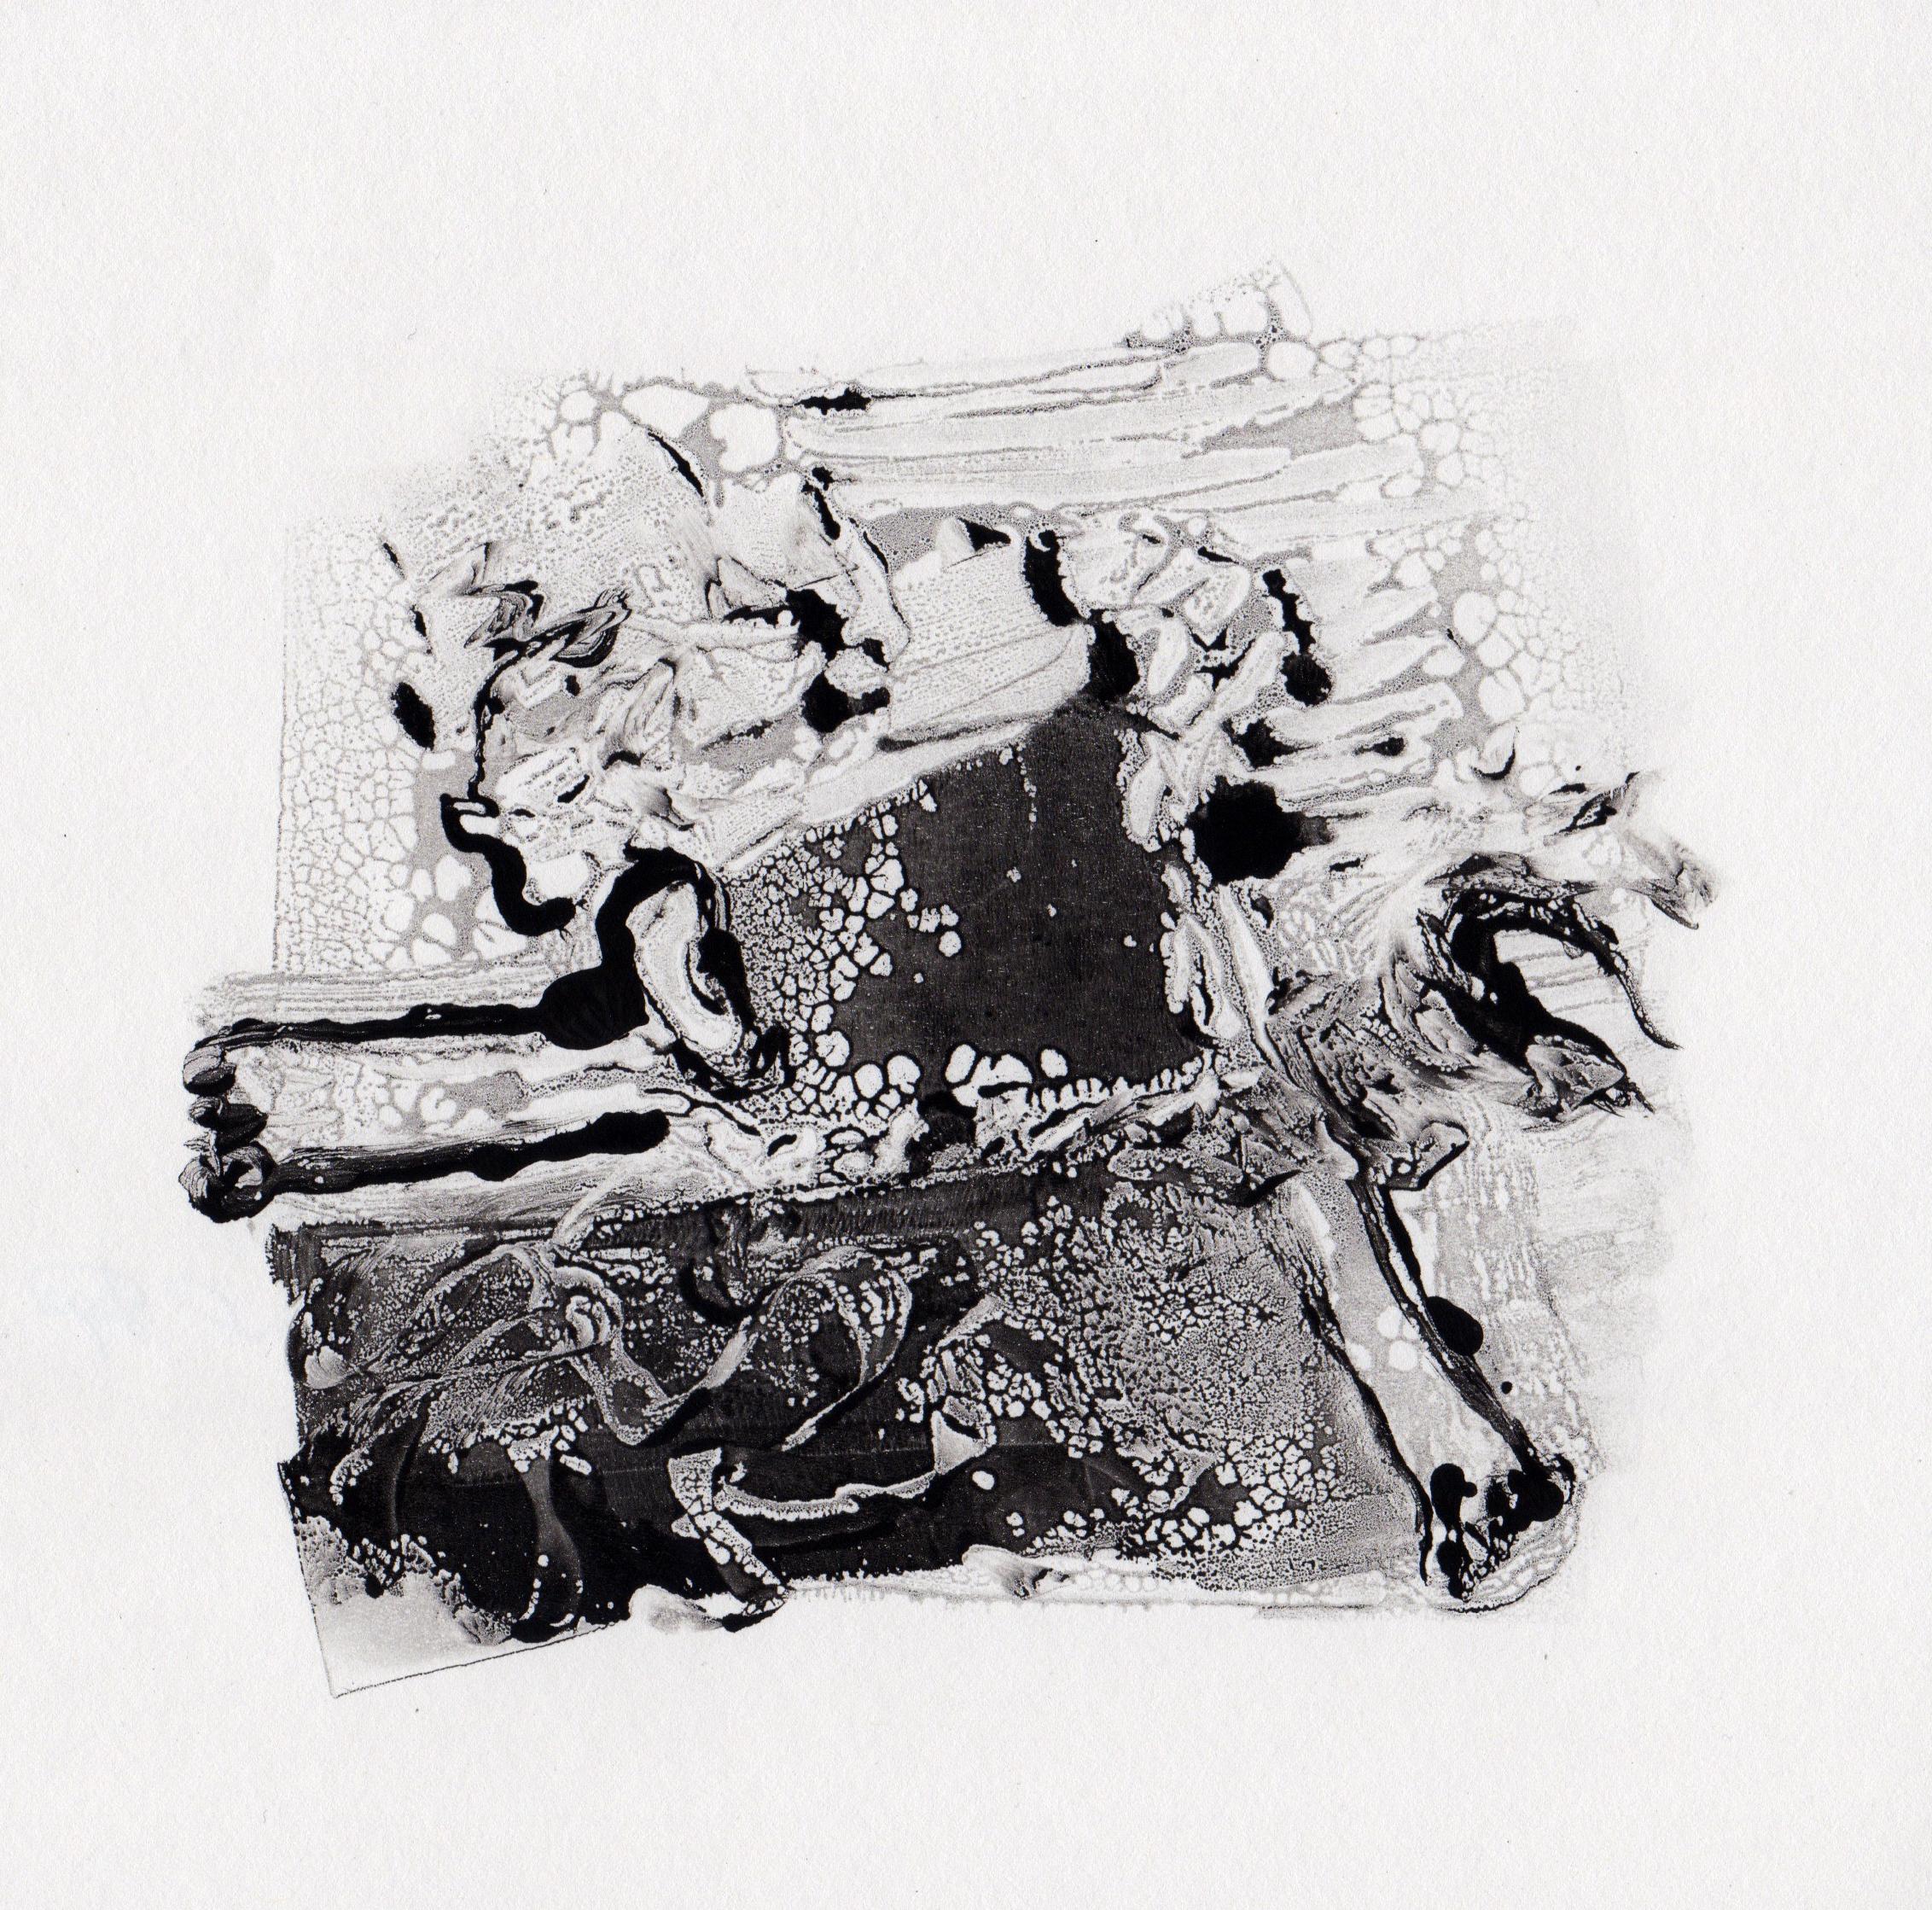 Cosmic Wind, 2014, gelatin monotype, 10x9 inches